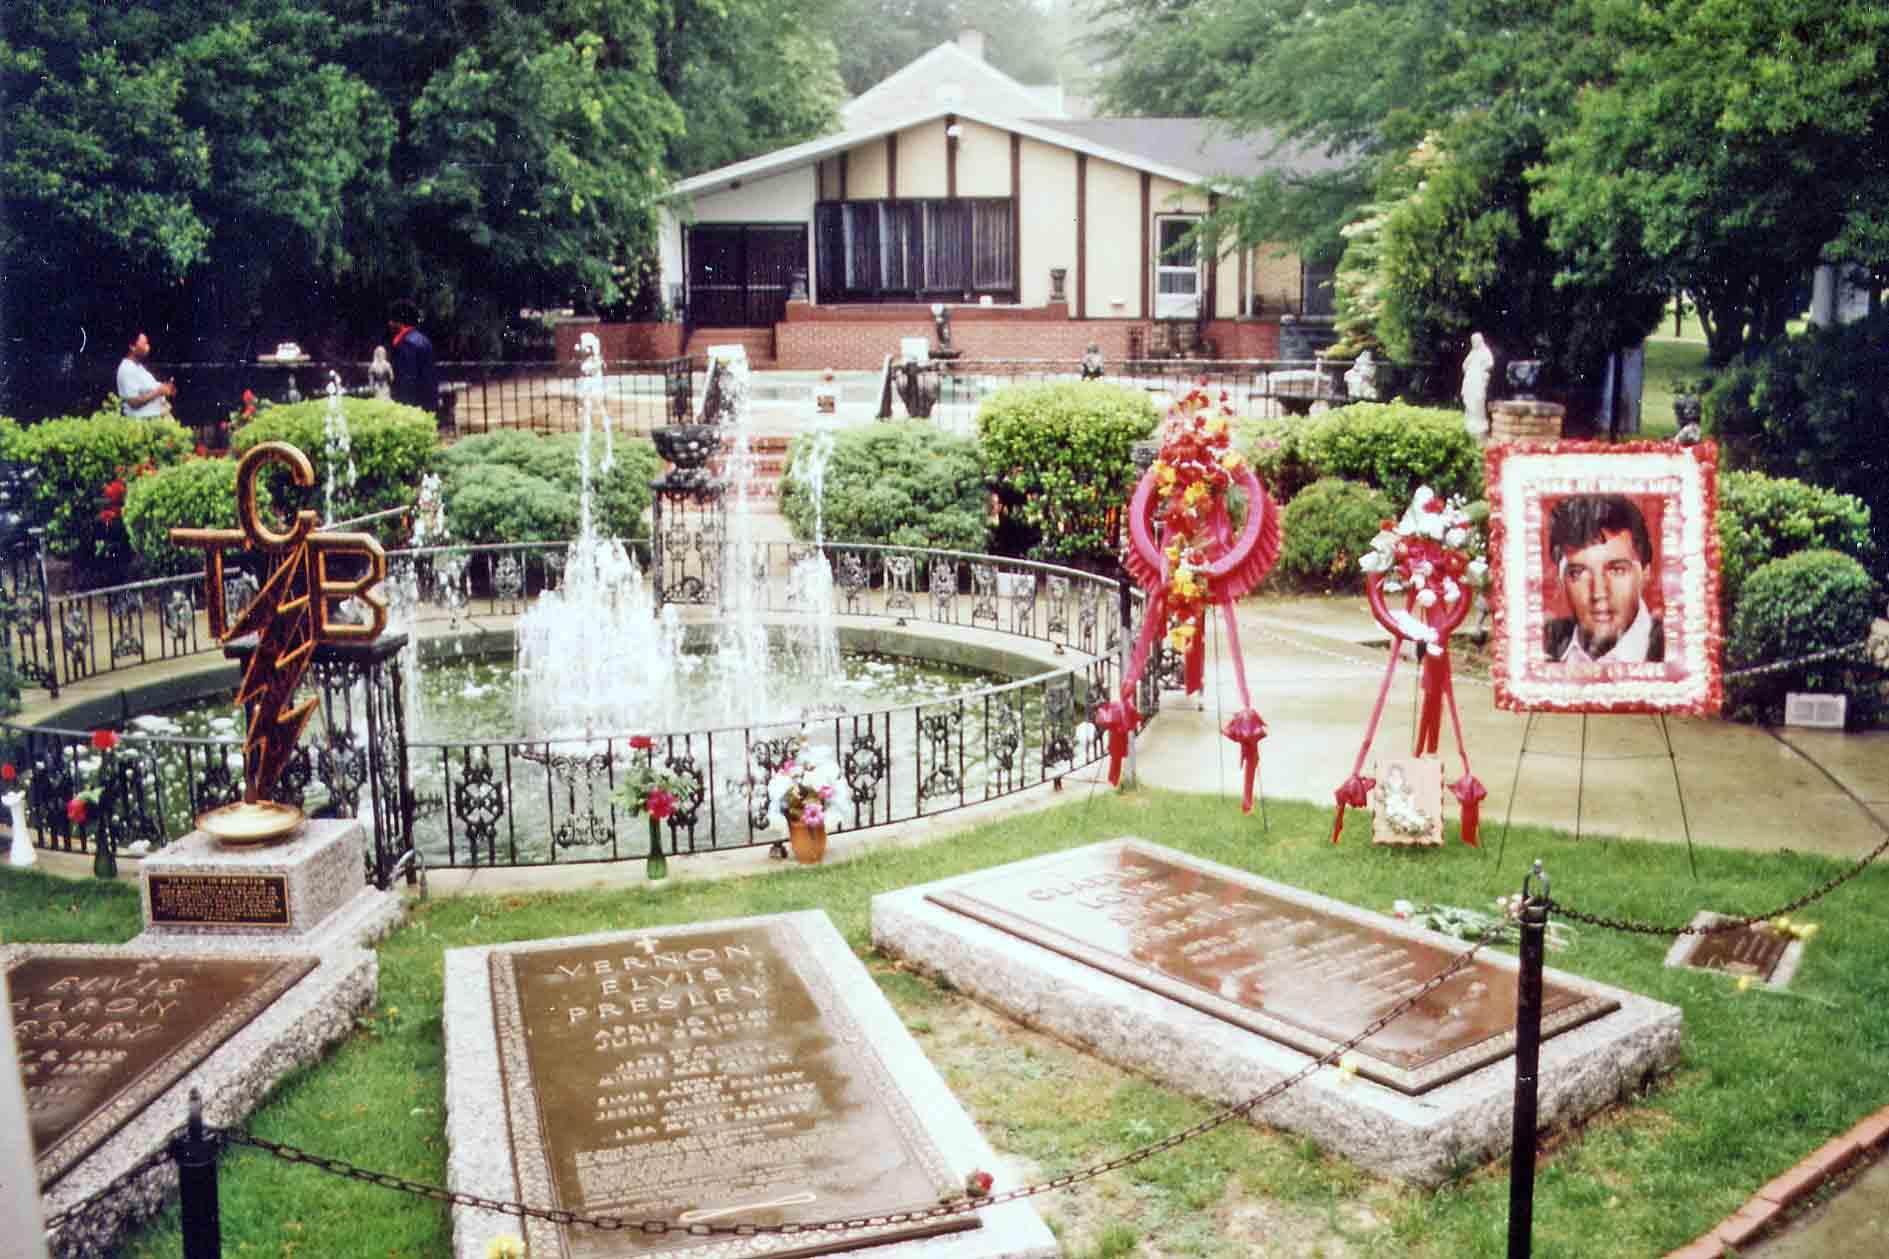 Graceland, Memphys - Elvis Presley grave